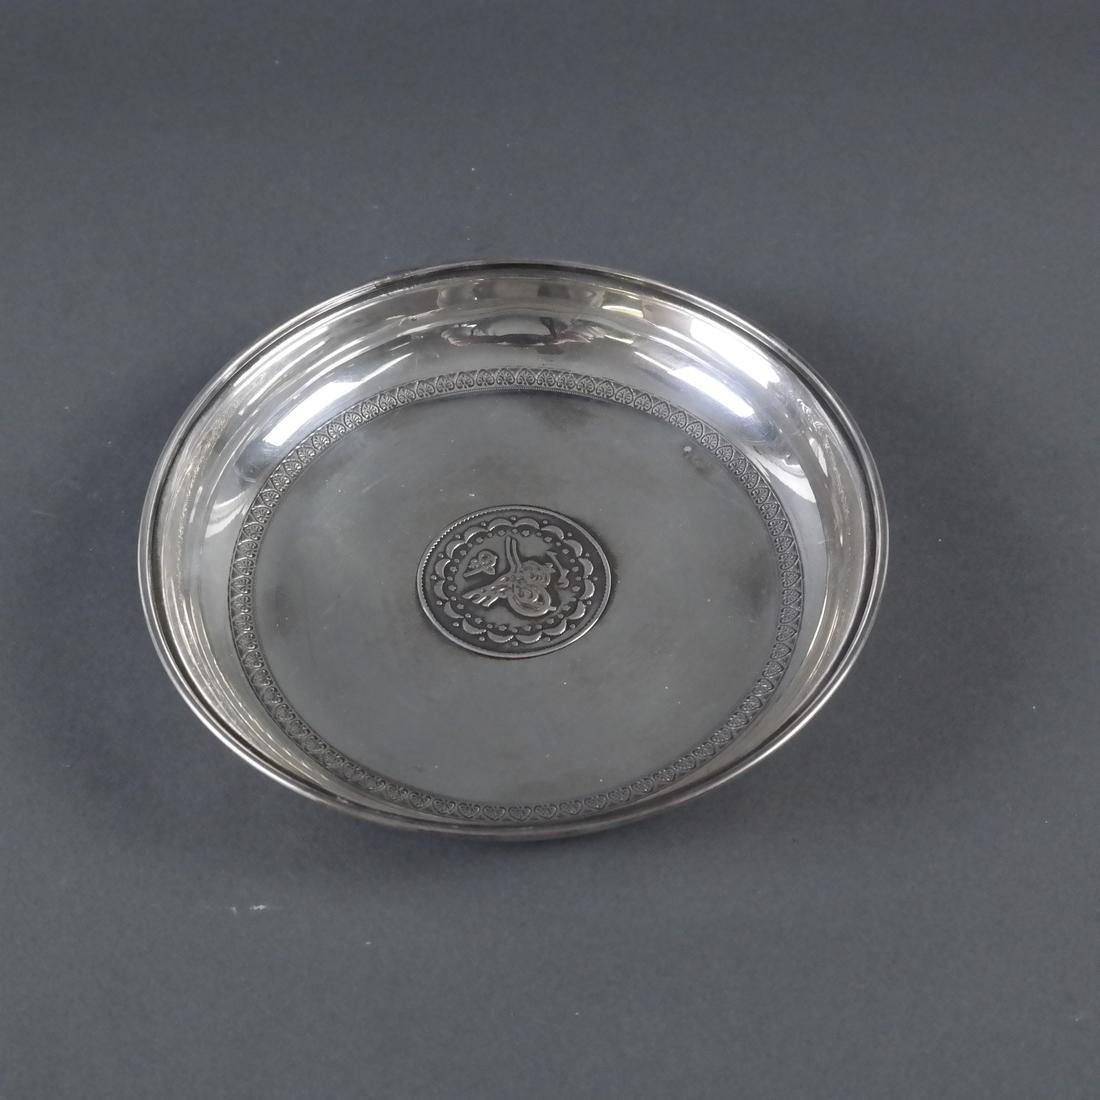 .900 Standard Silver Bowl